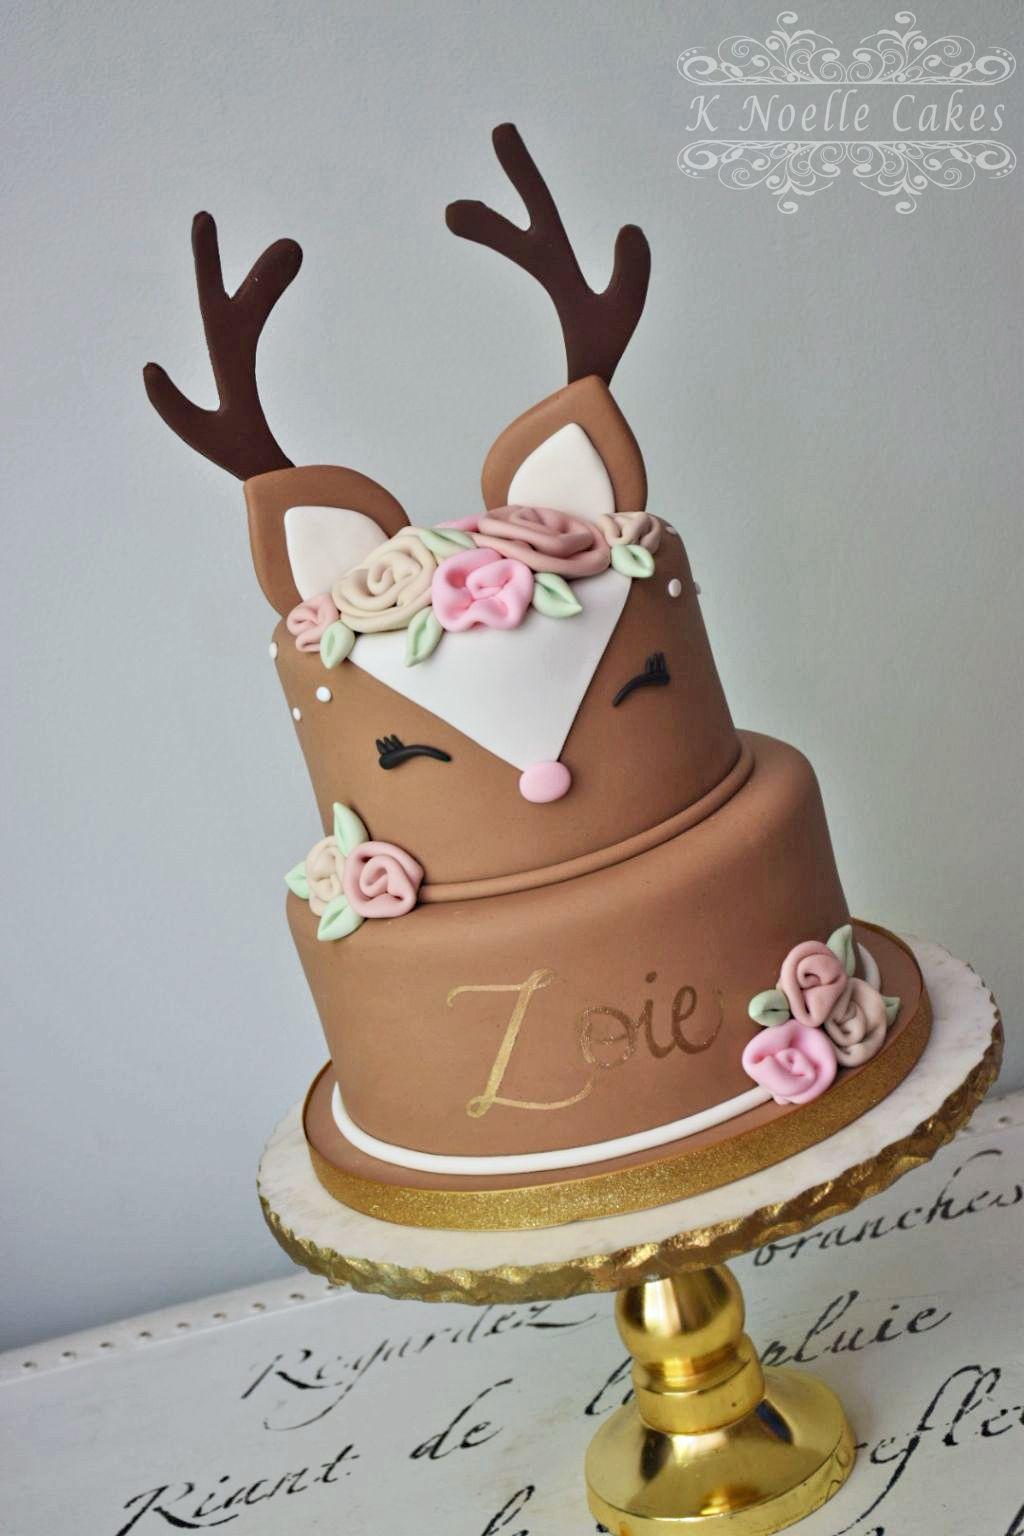 Remarkable Deer Cake By K Noelle Cakes Deer Cakes 1St Birthday Cake For Birthday Cards Printable Inklcafe Filternl